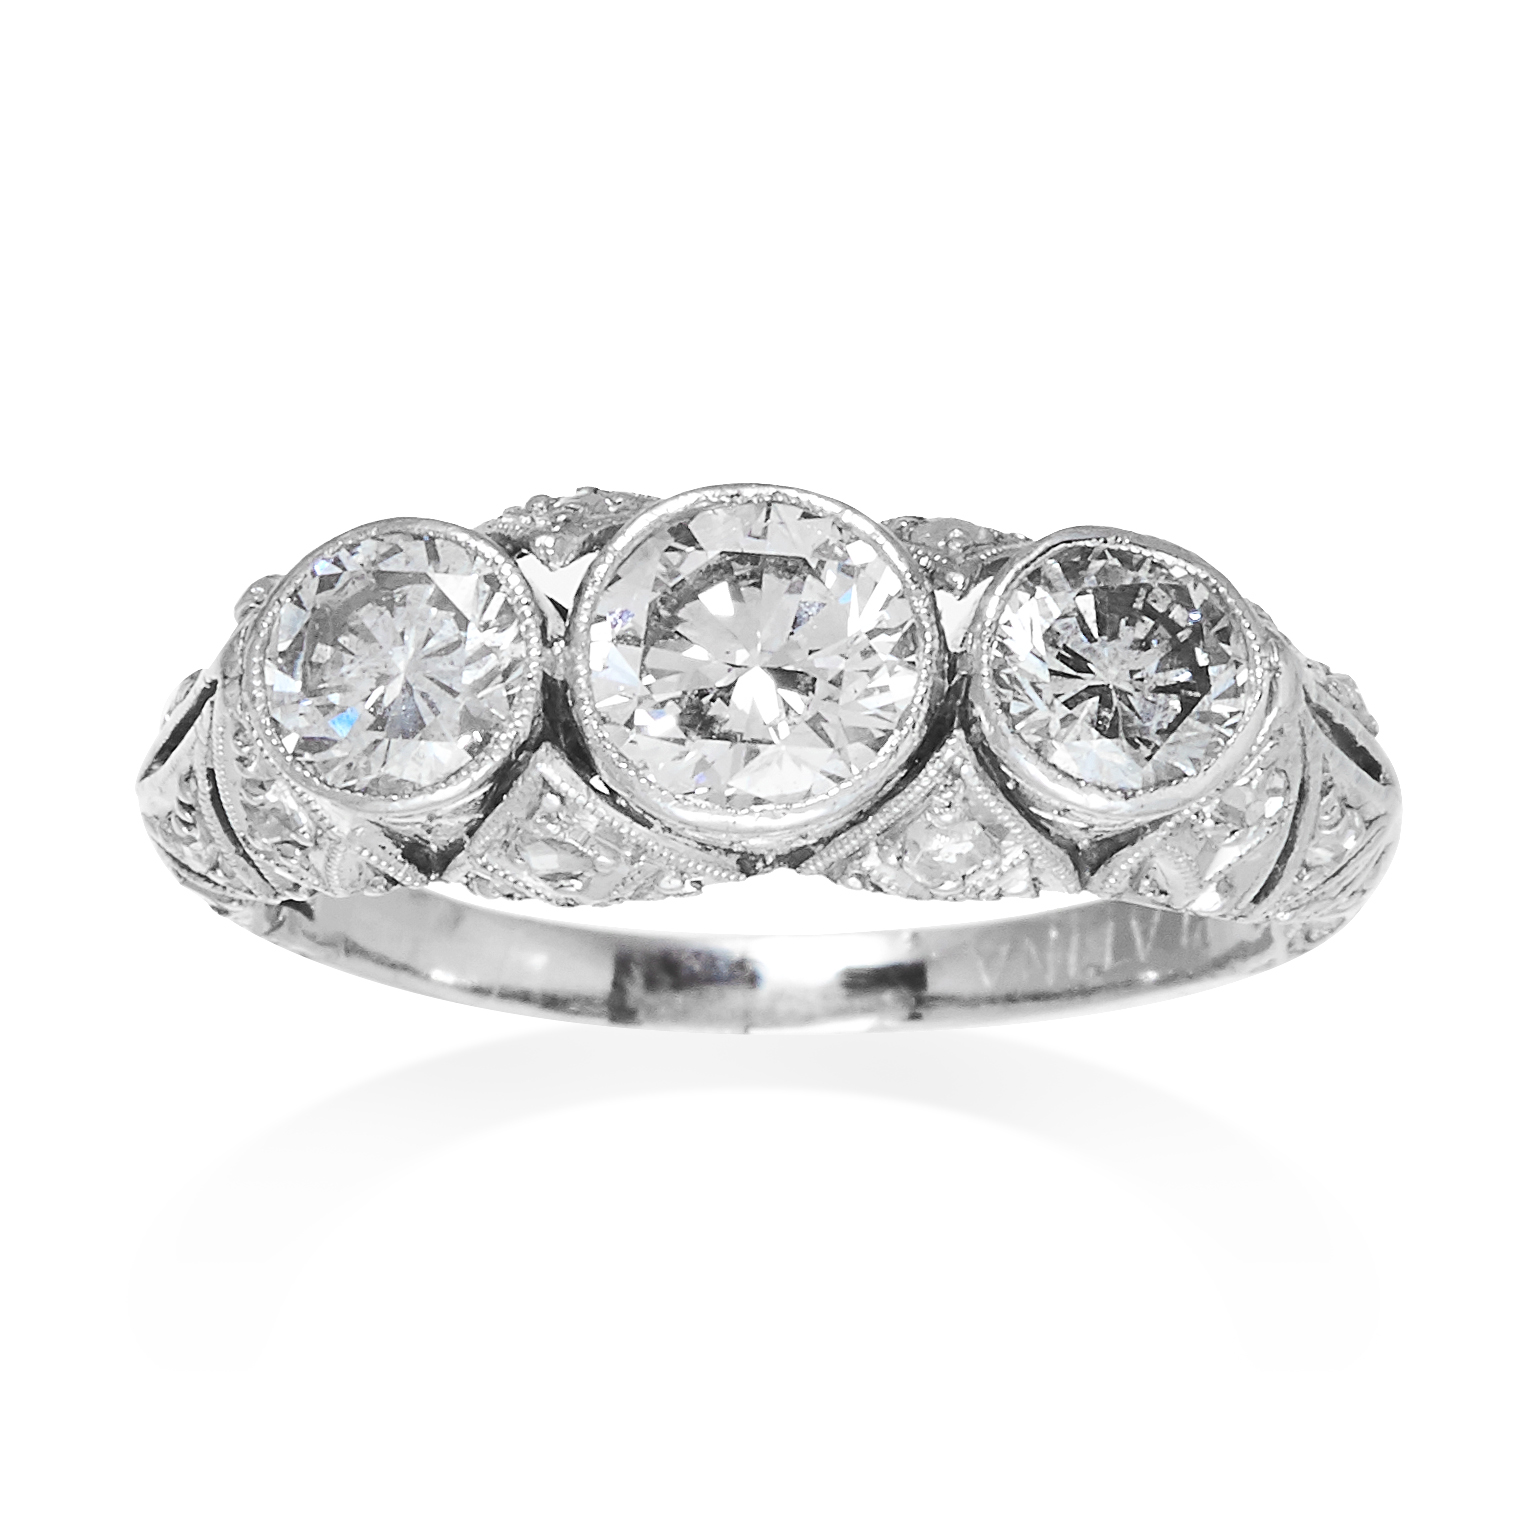 AN ART DECO DIAMOND DRESS RING in platinum, the trio of graduated round cut diamonds totalling 1.